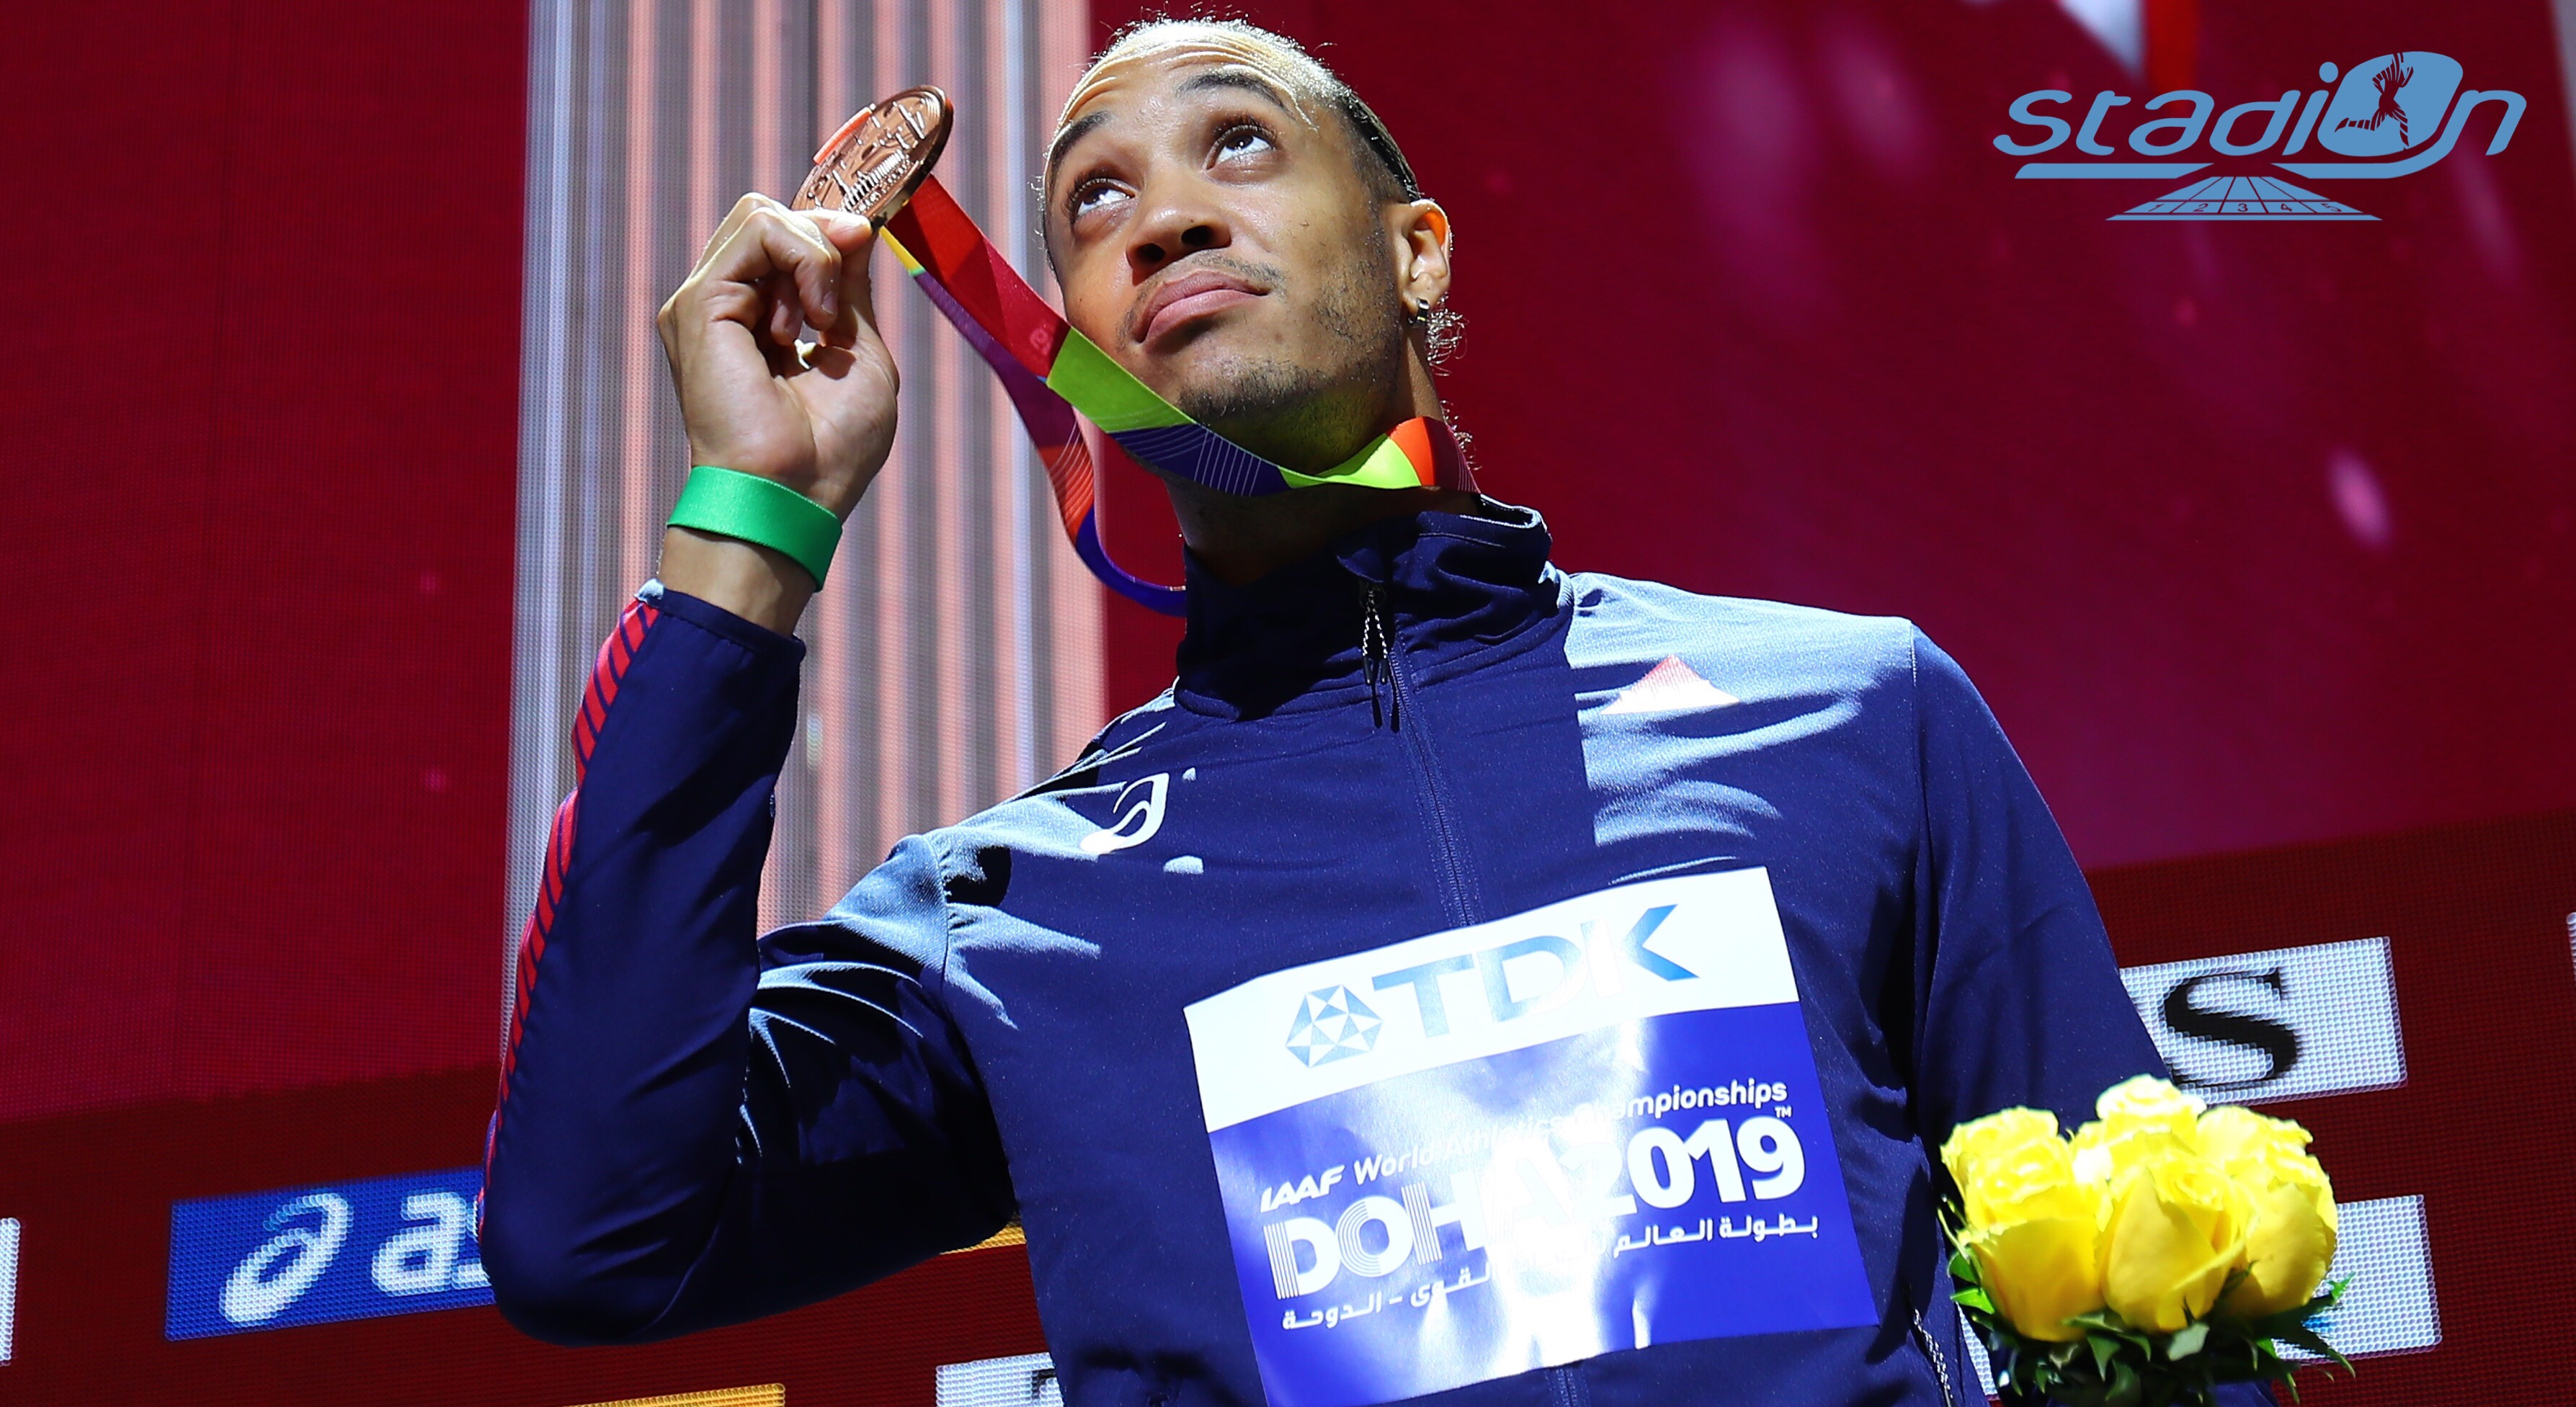 Championnats du Monde Doha